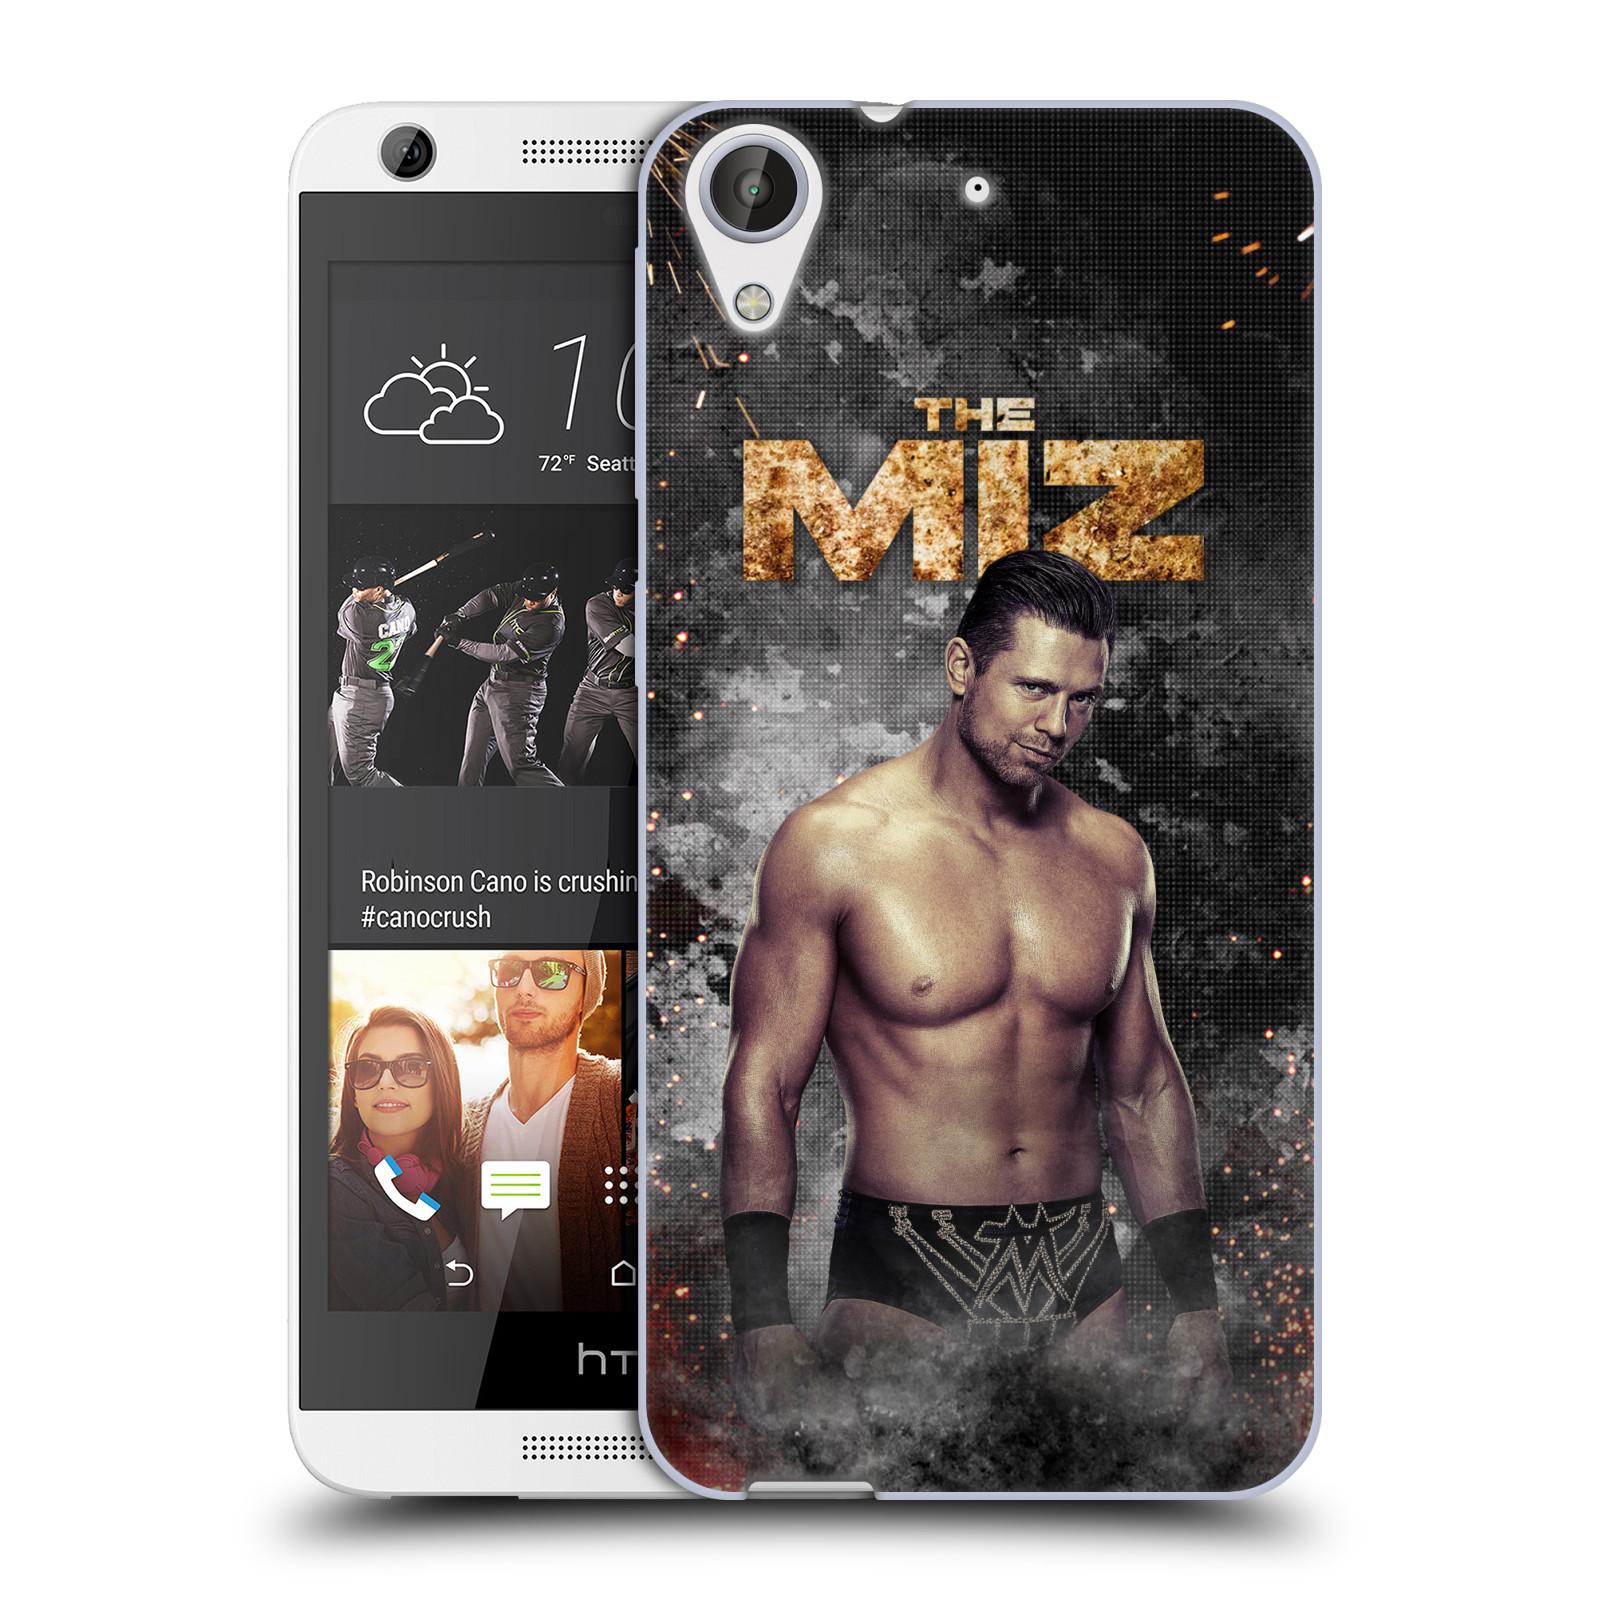 OFFICIAL WWE THE MIZ SOFT GEL CASE FOR HTC PHONES 1